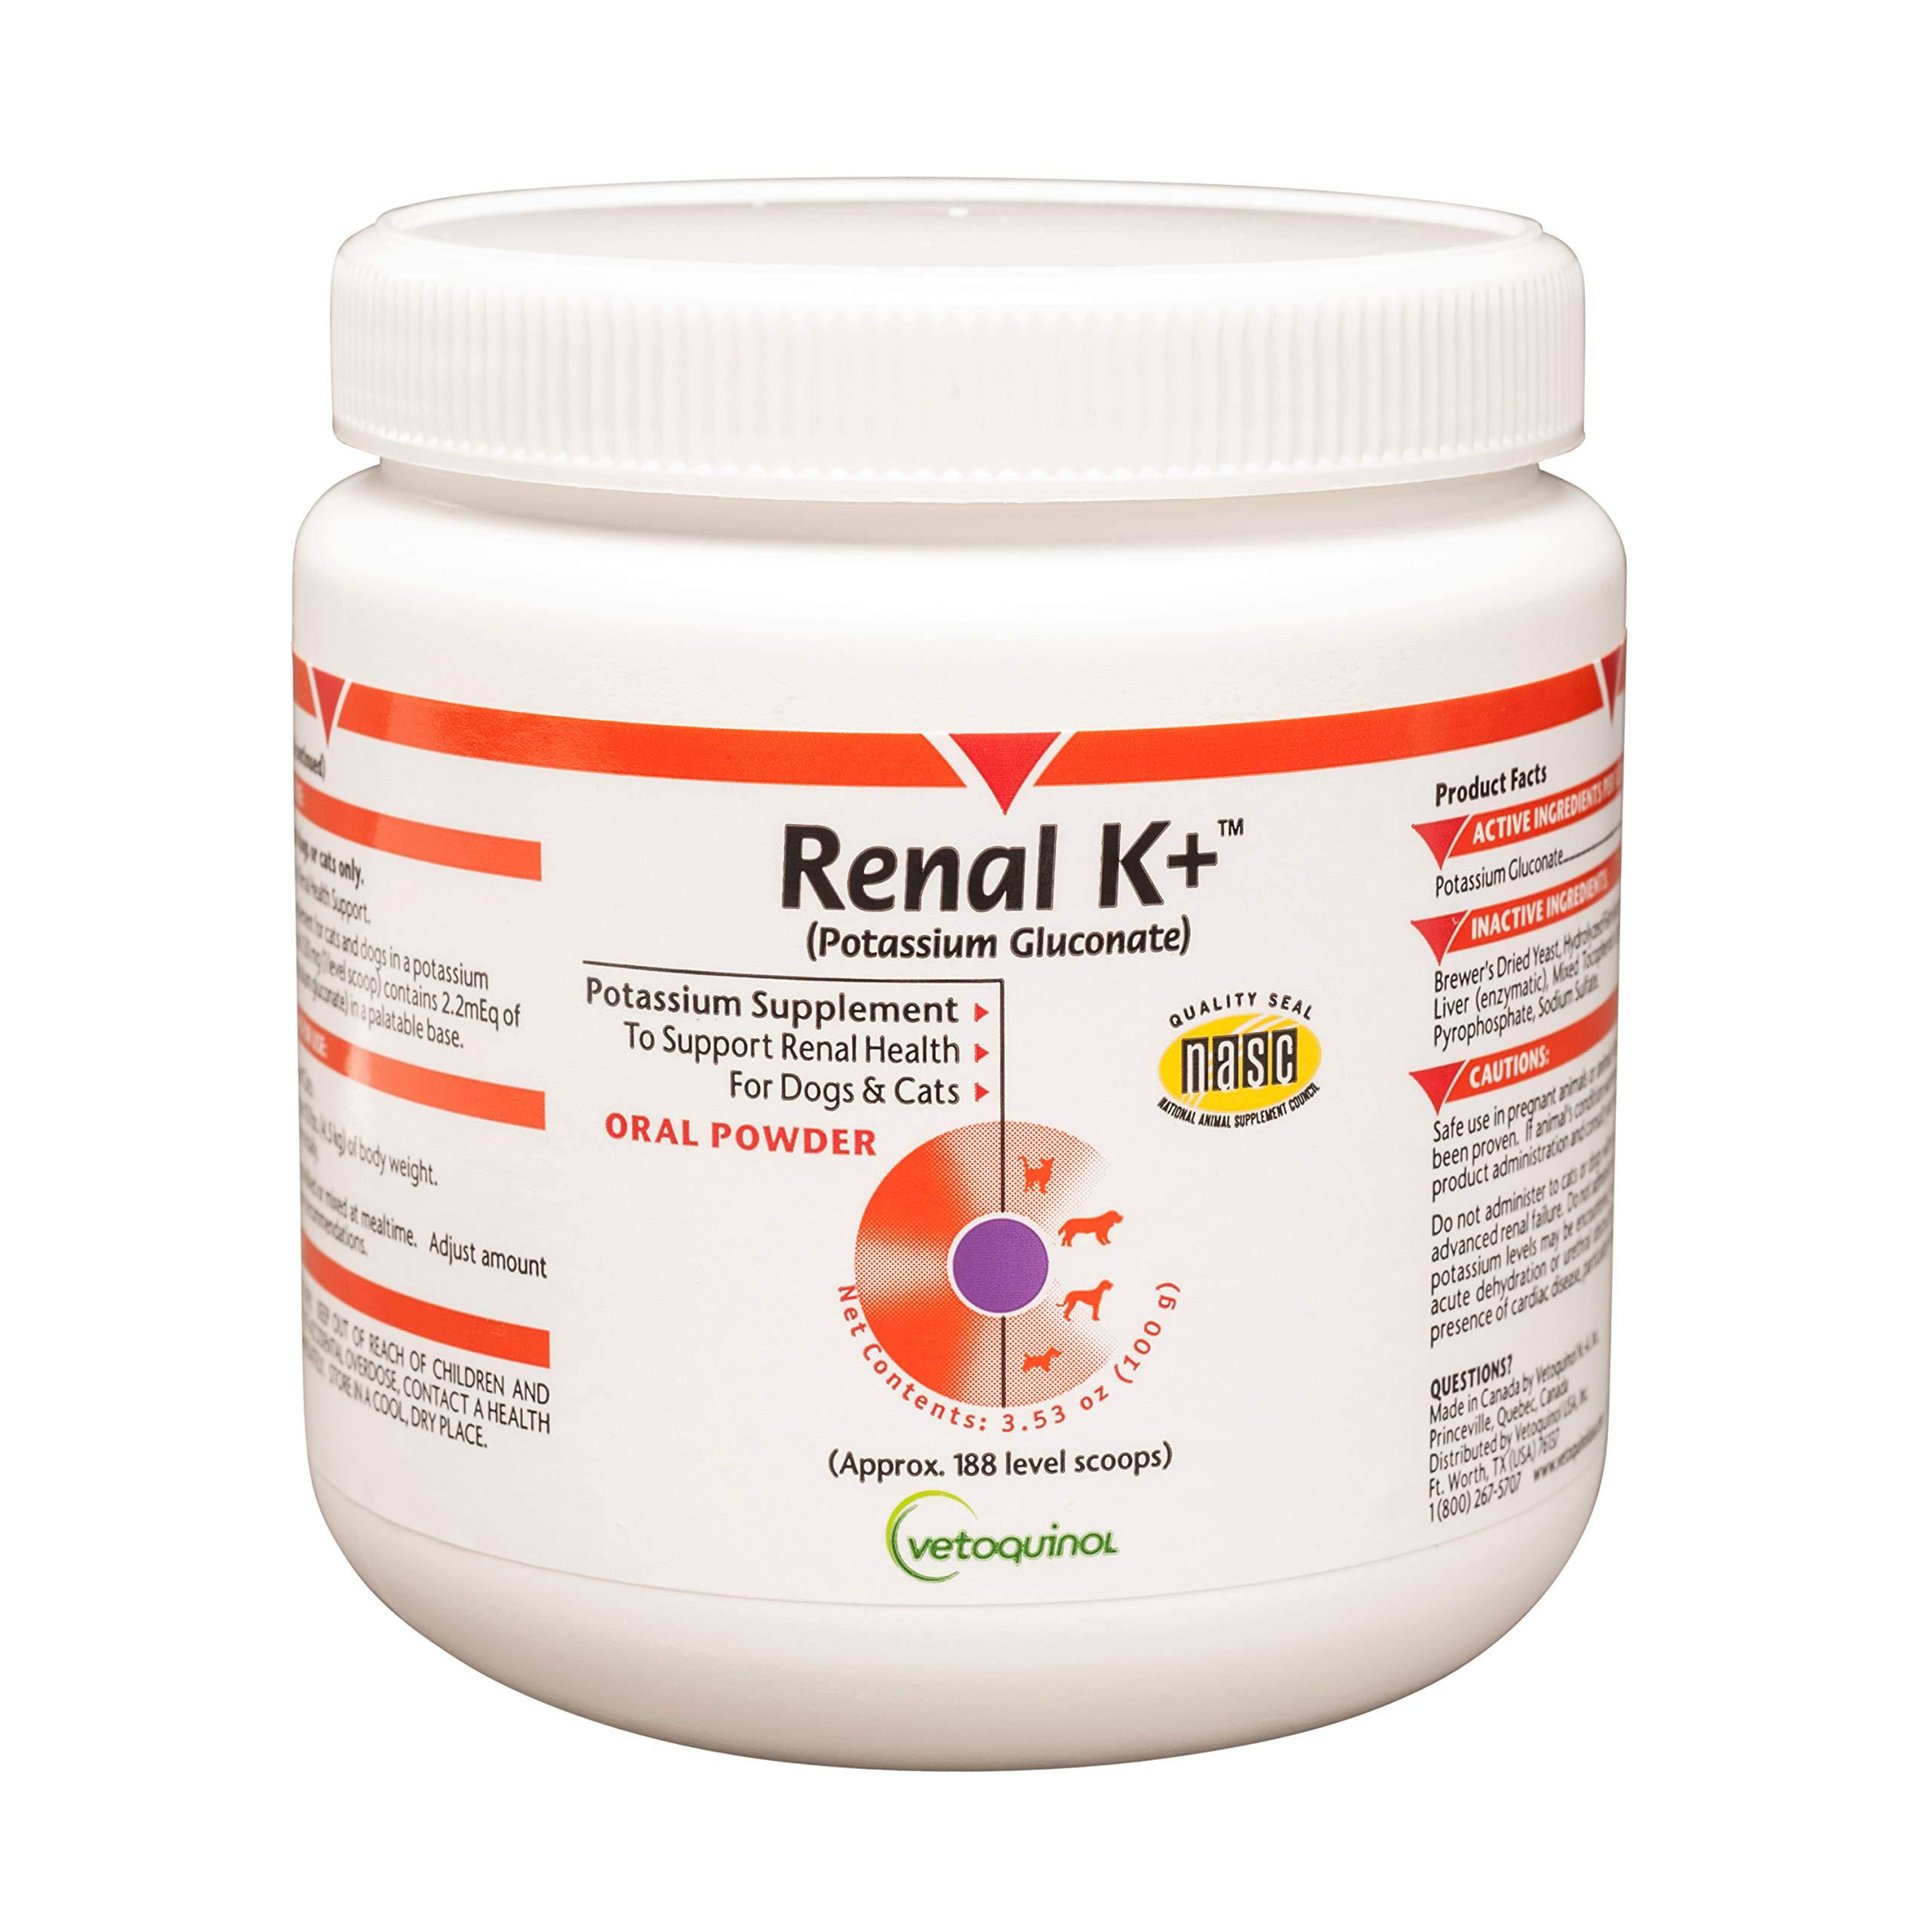 Vetoquinol Renal K+ (Potassium Gluconate) Potassium Supplement Powder for Dogs and Cats, 3.5oz by Vetoquinol